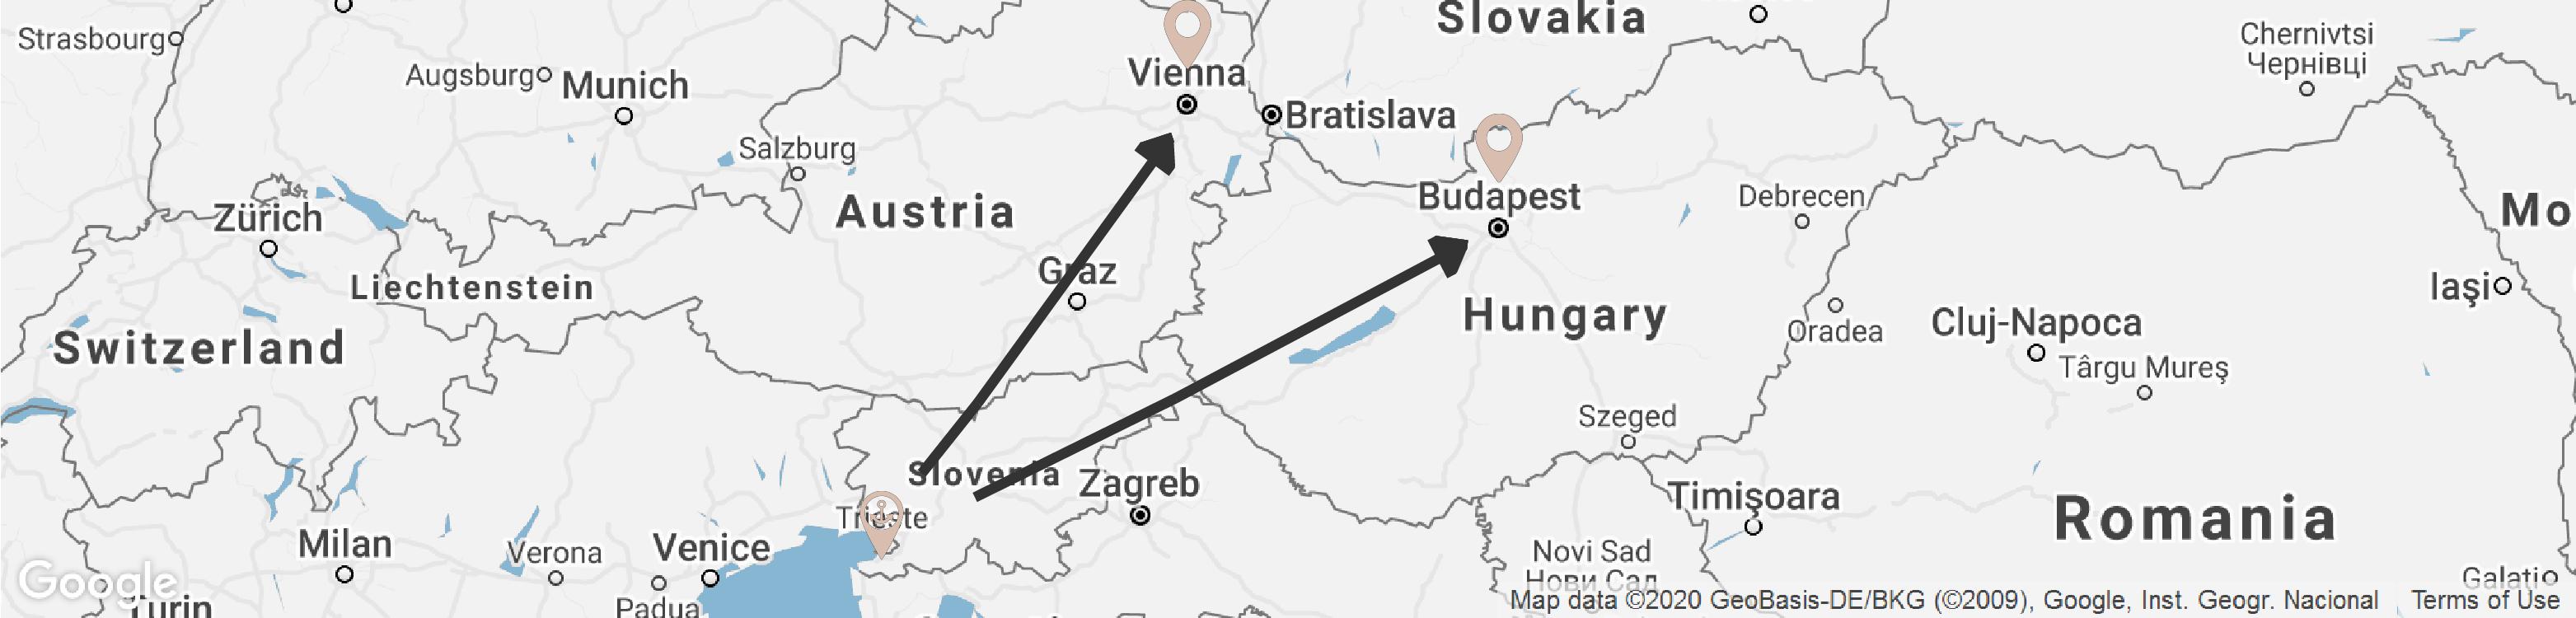 budapest vienna map